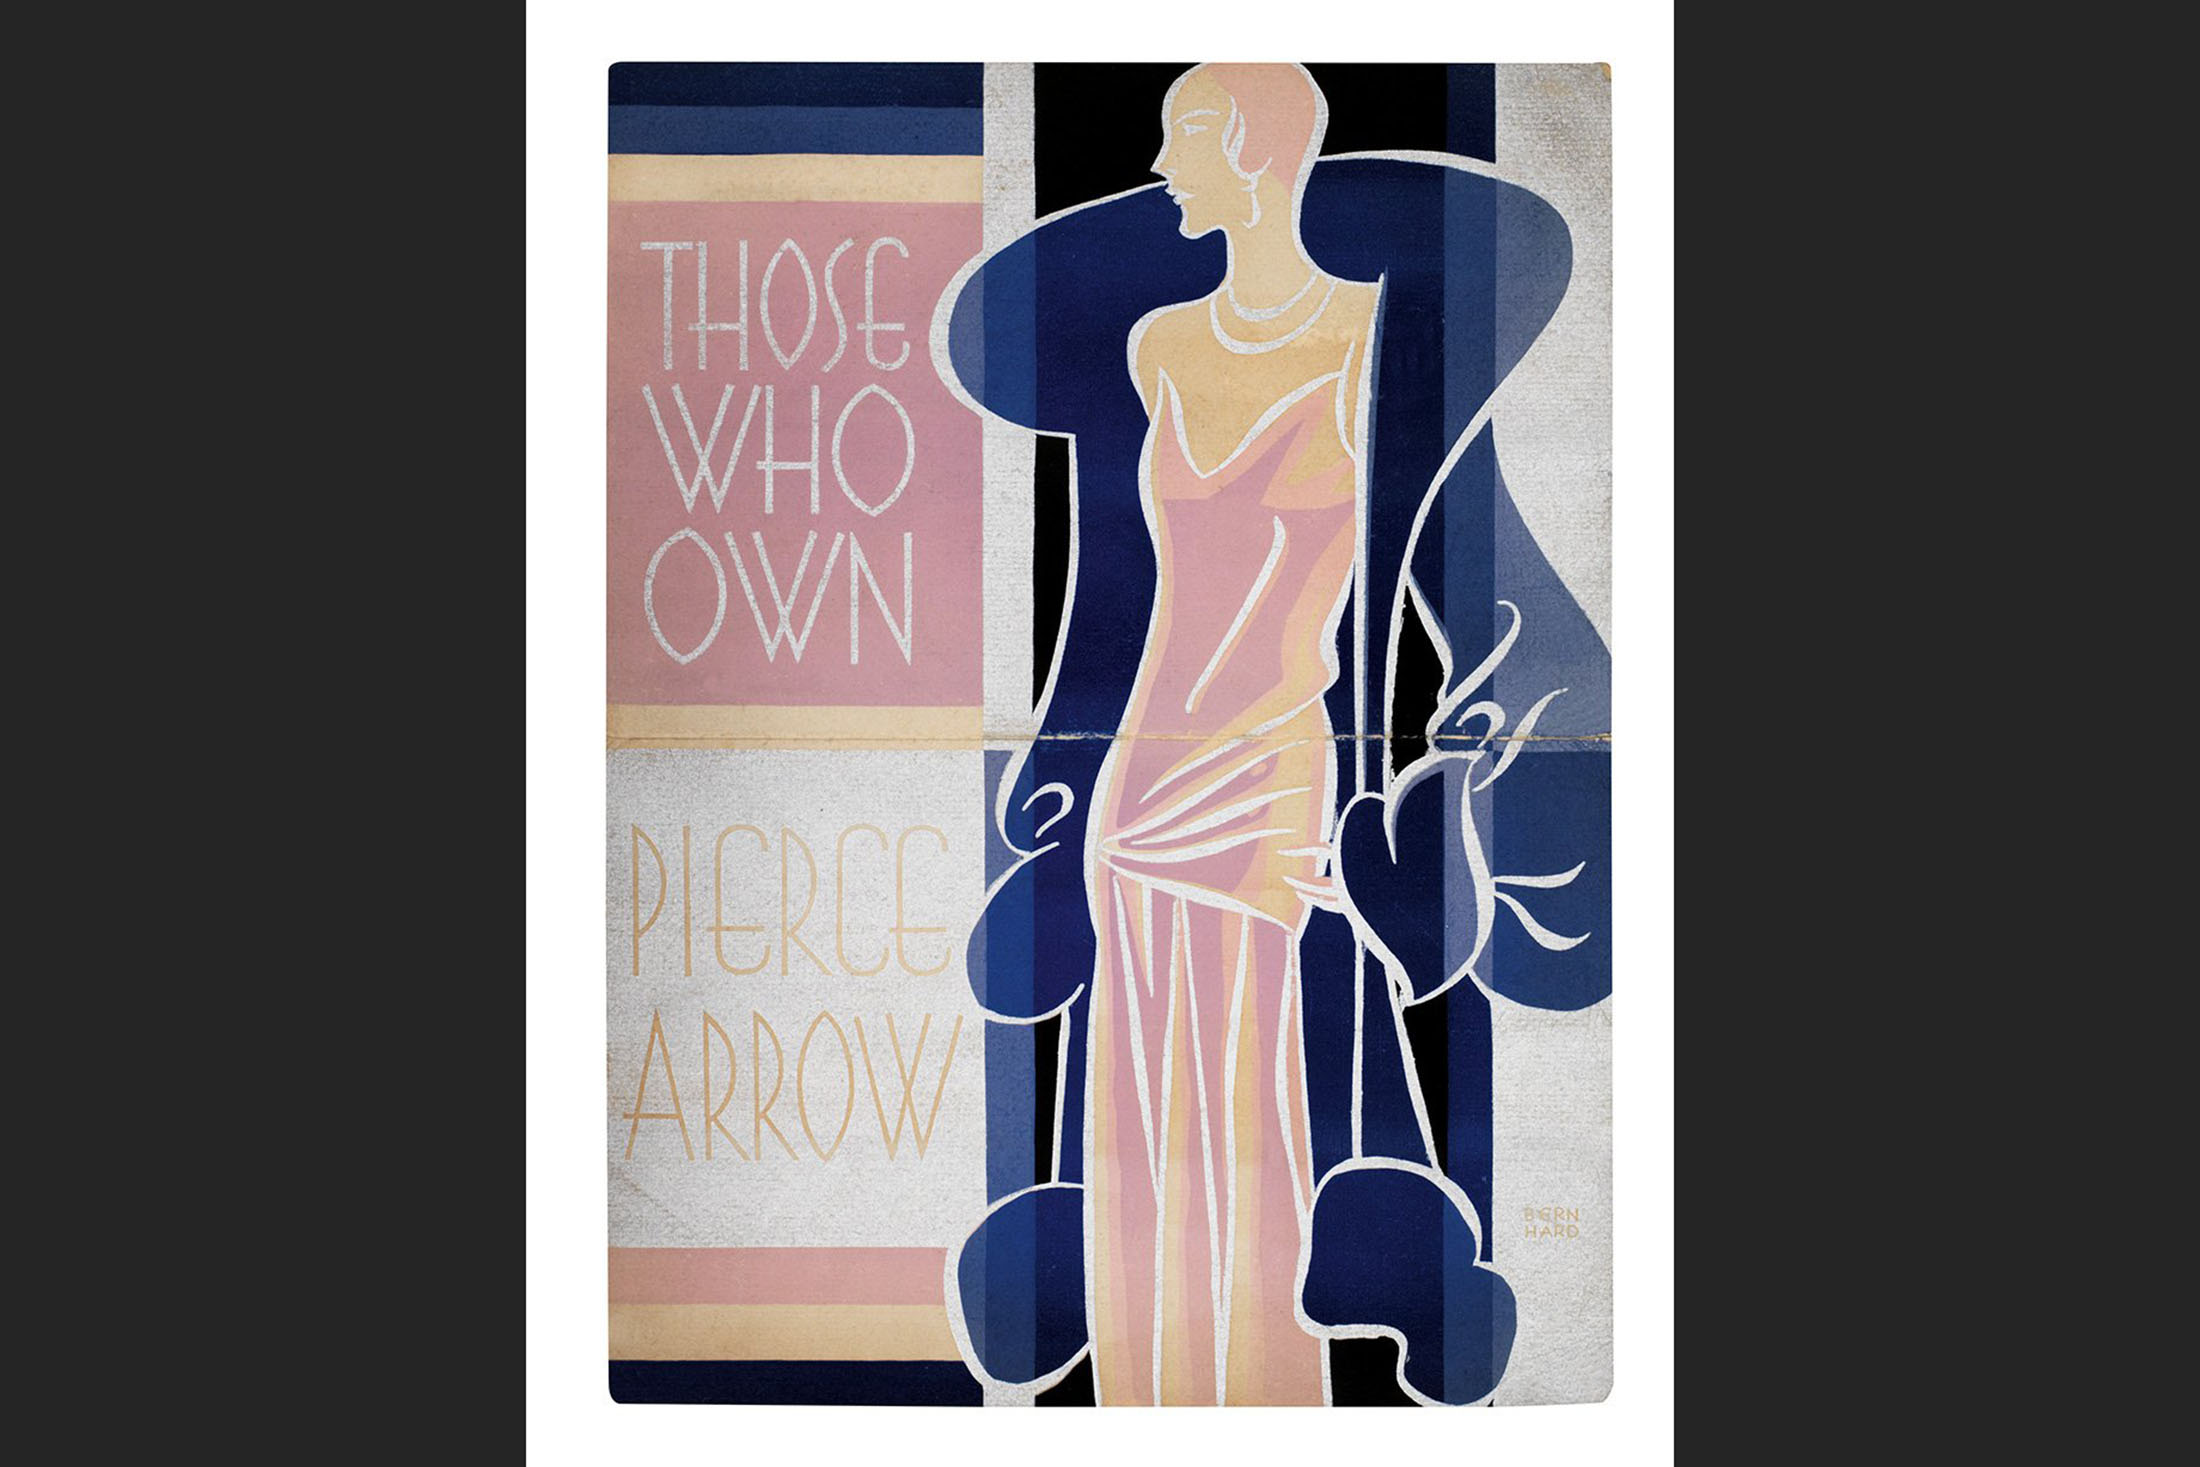 Pierce-Arrow, 1930